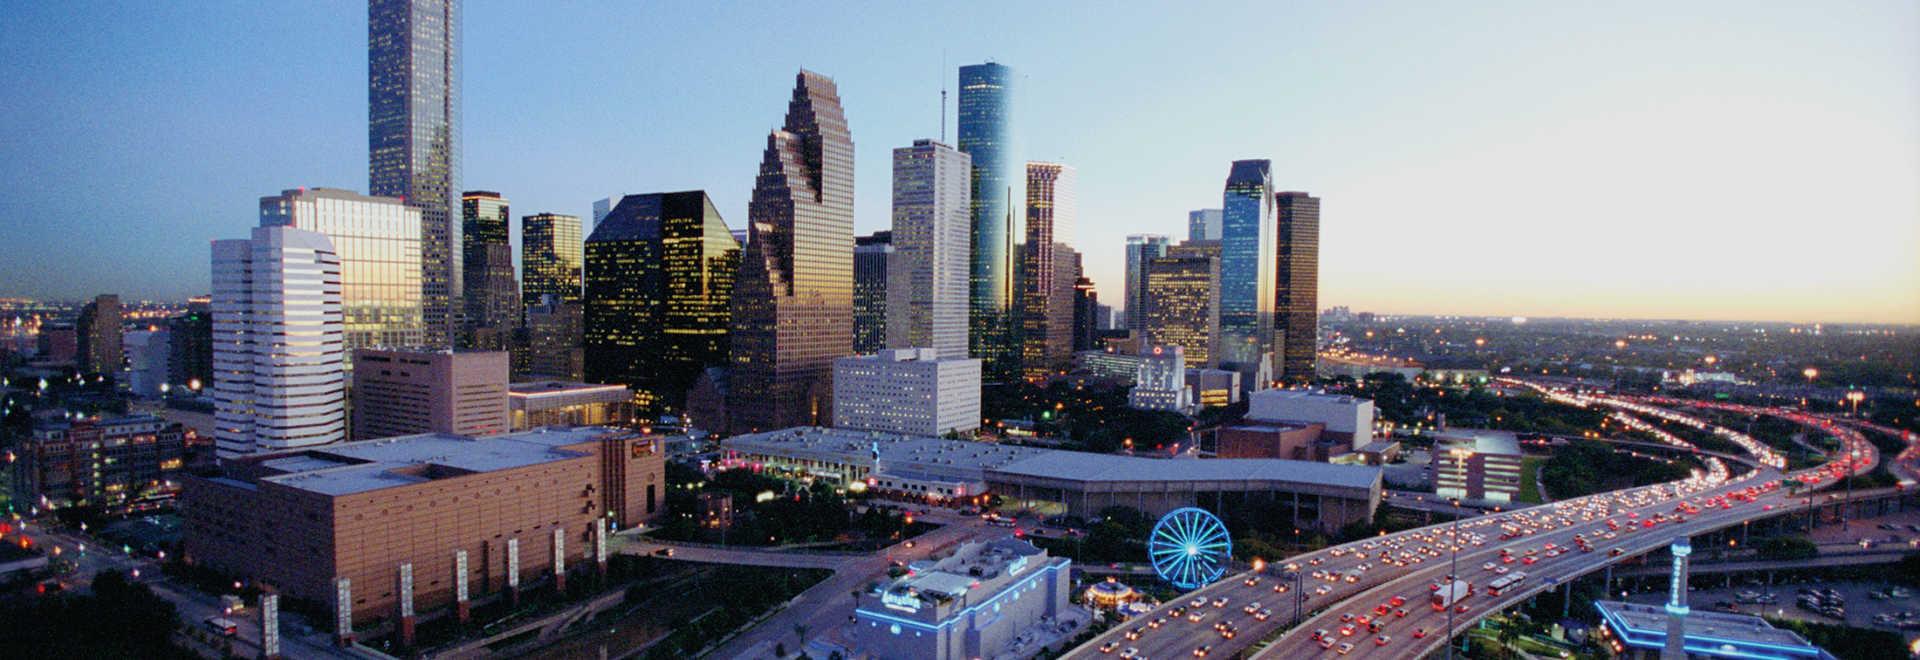 Houston Travel Planning Maps Trip Ideas Deals